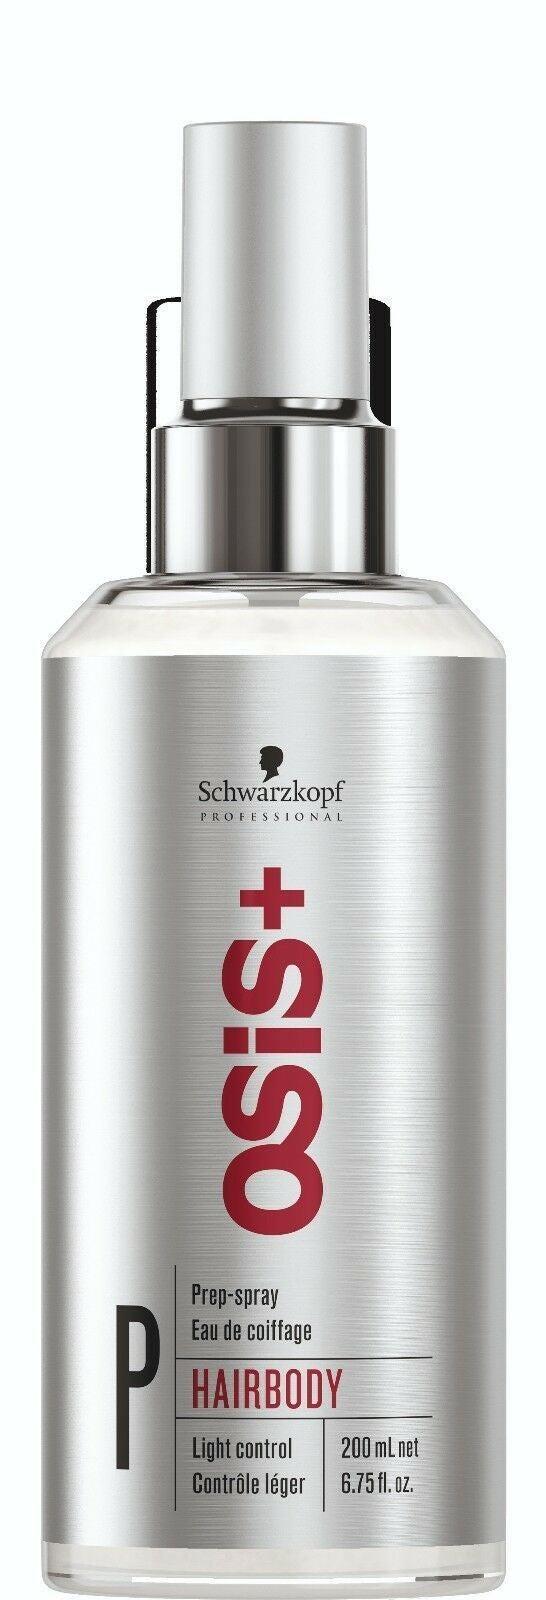 Schwarzkopf Osis + Hair Body Prep Spray 200ml x 1 Hairbody